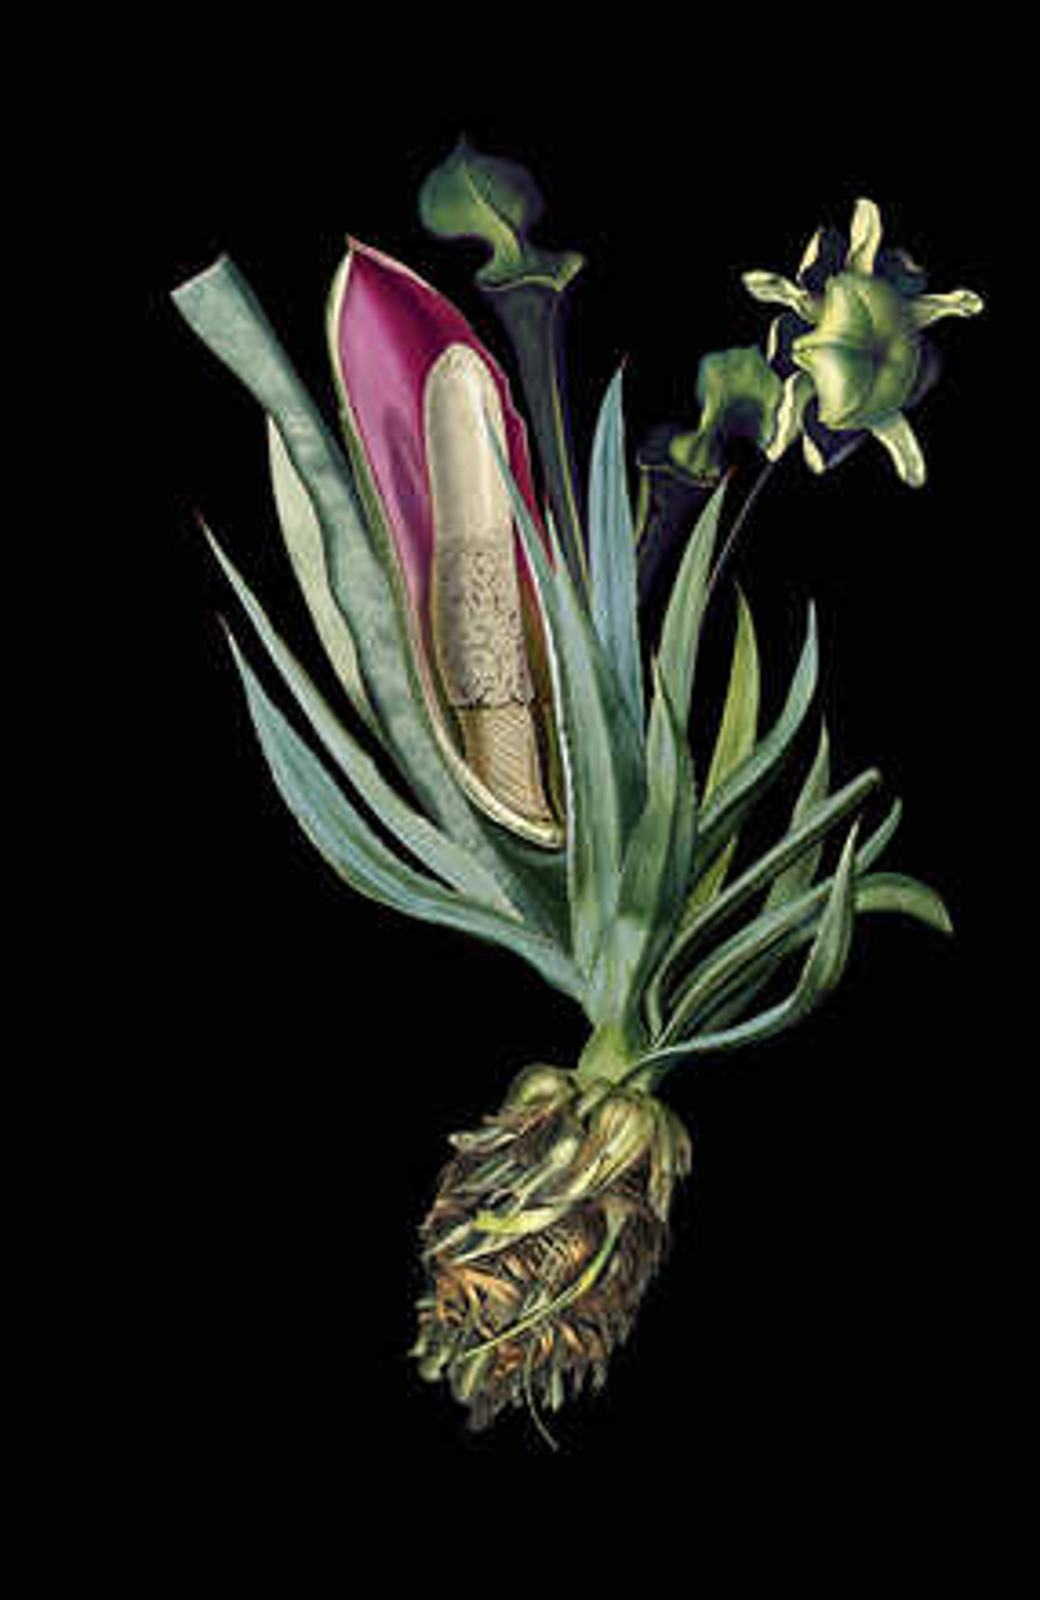 Aloedendron - Rive Roshan